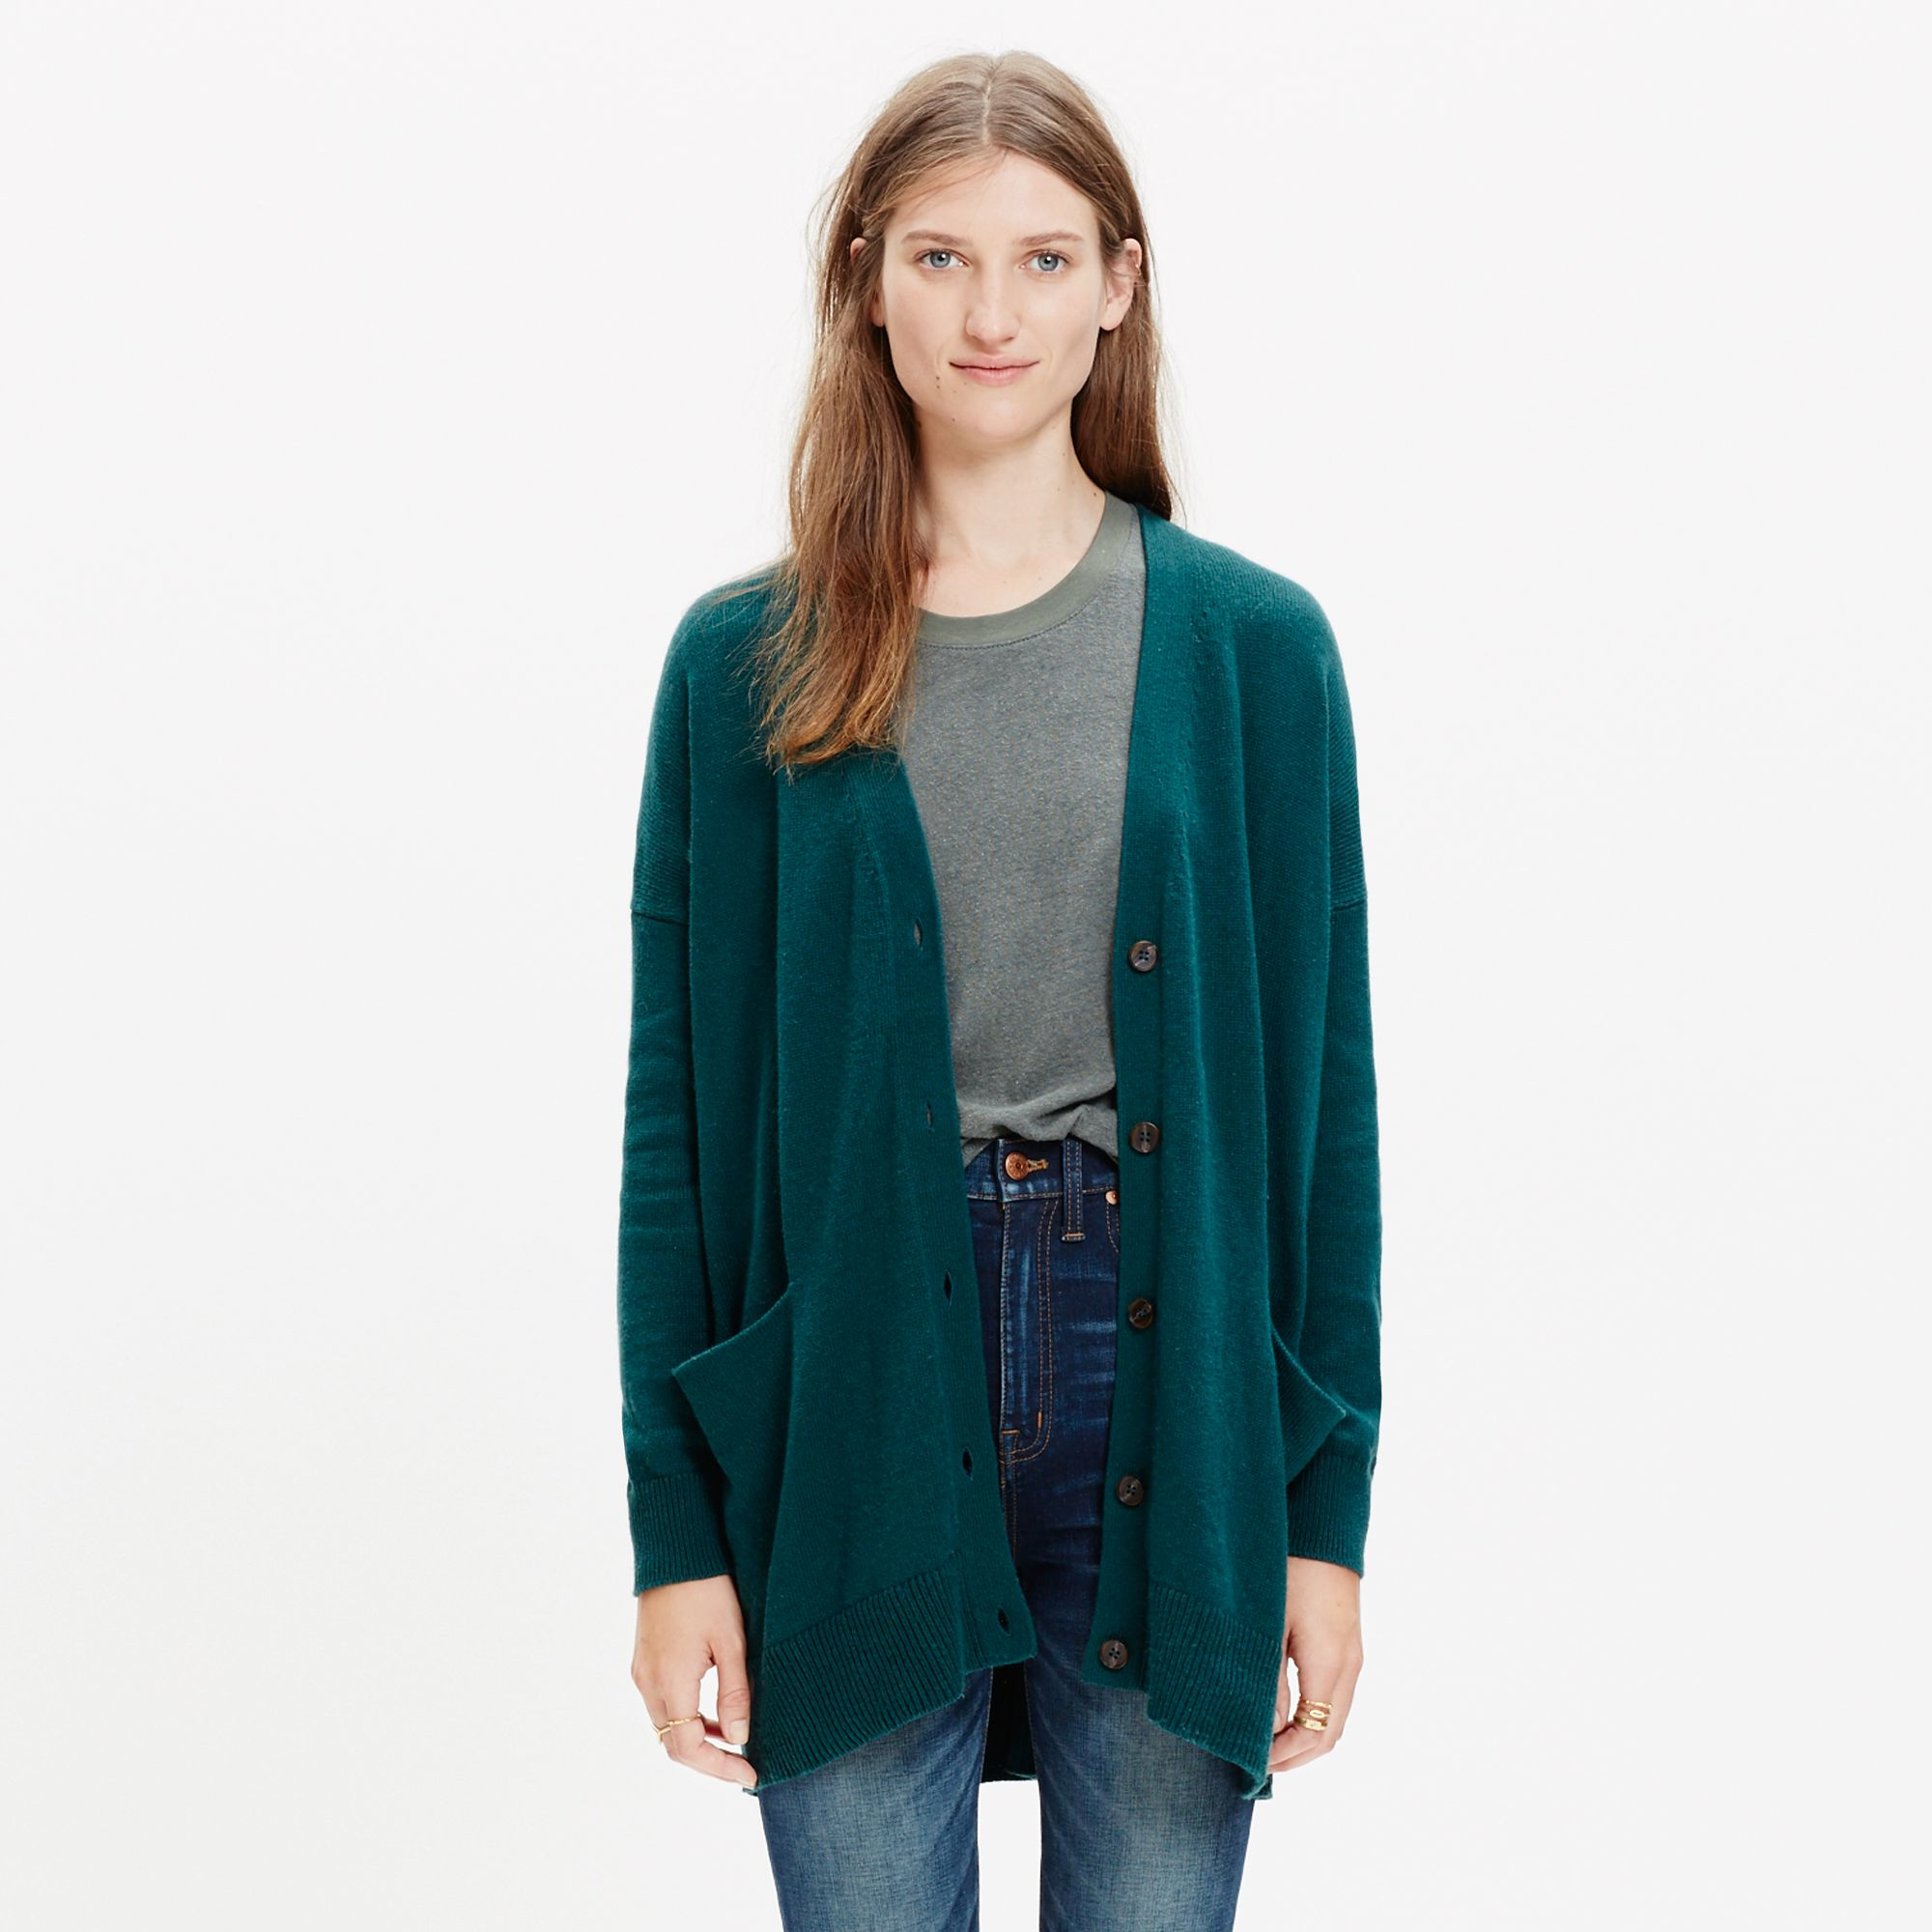 Madewell Long Cardigan Sweater in Green | Lyst